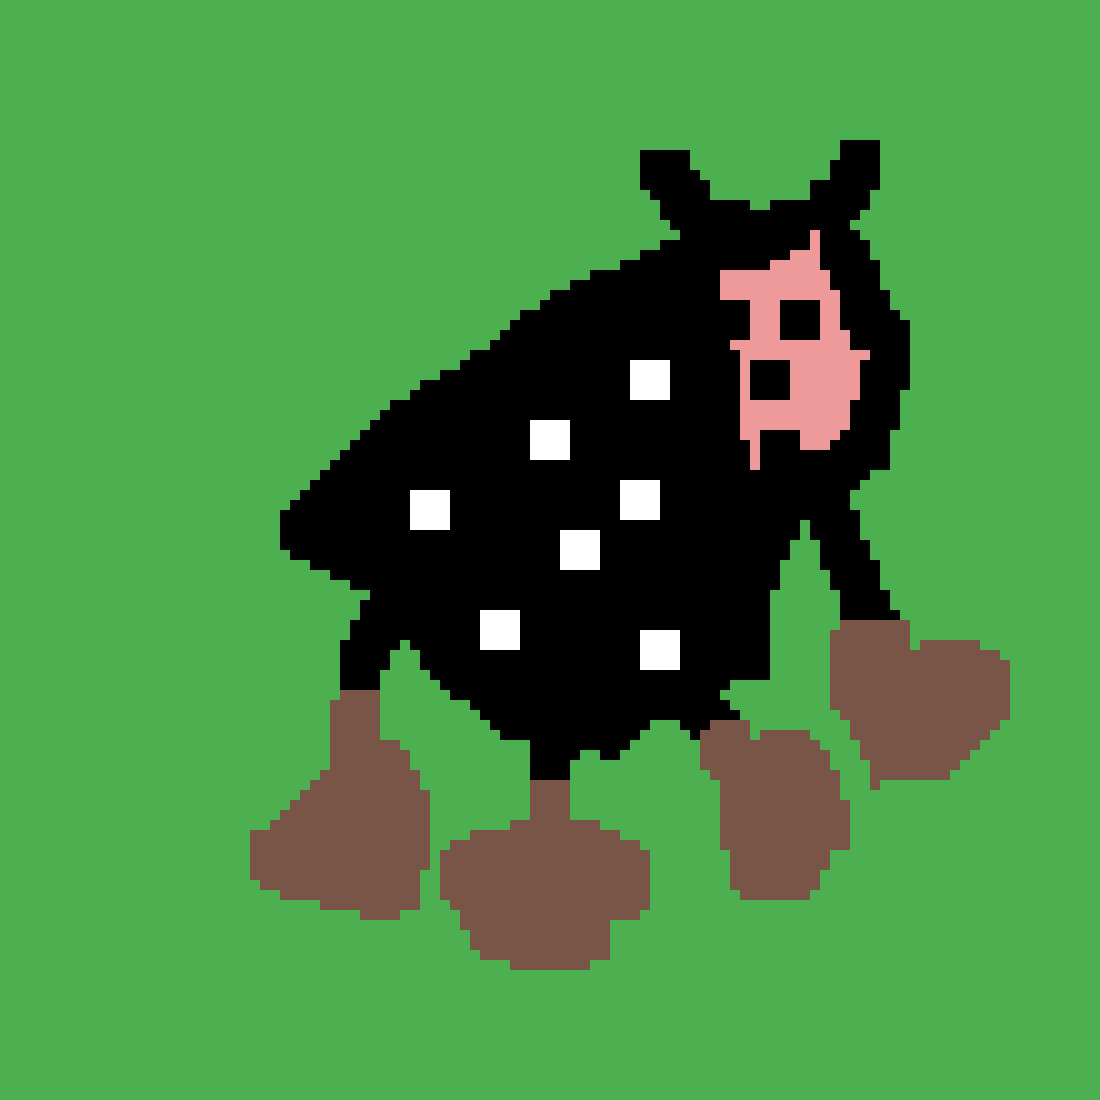 cow cow cow (I _ I) by Amidala